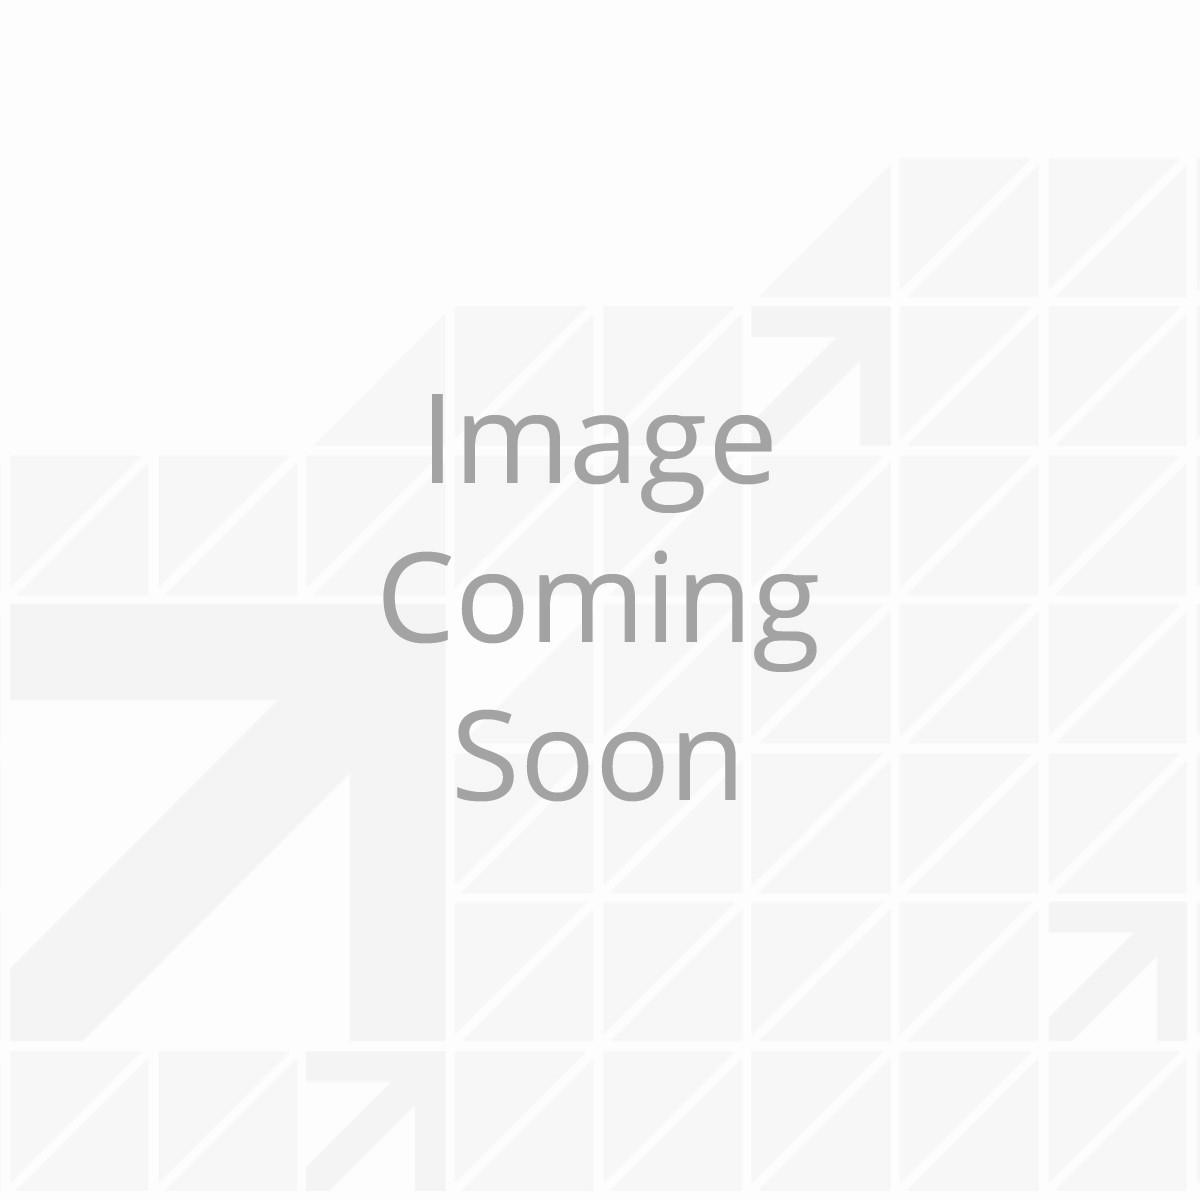 2.5 x 2.5 Heavy-Duty Gear Pack Assembly